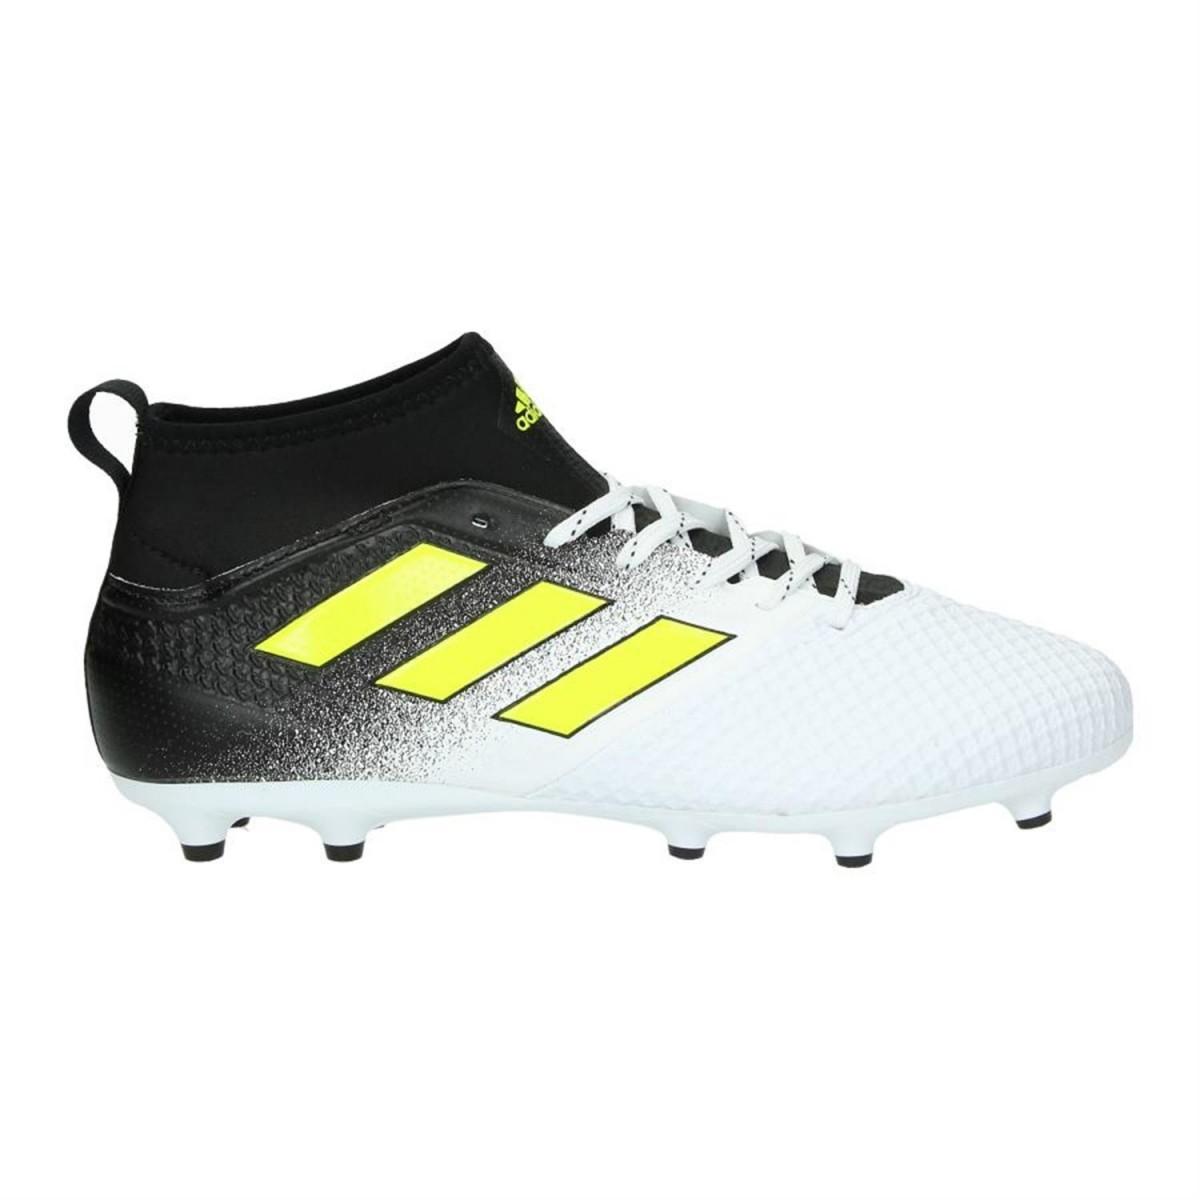 Chuteira Adidas Ace 17.3 FG  - Dozze Shoes